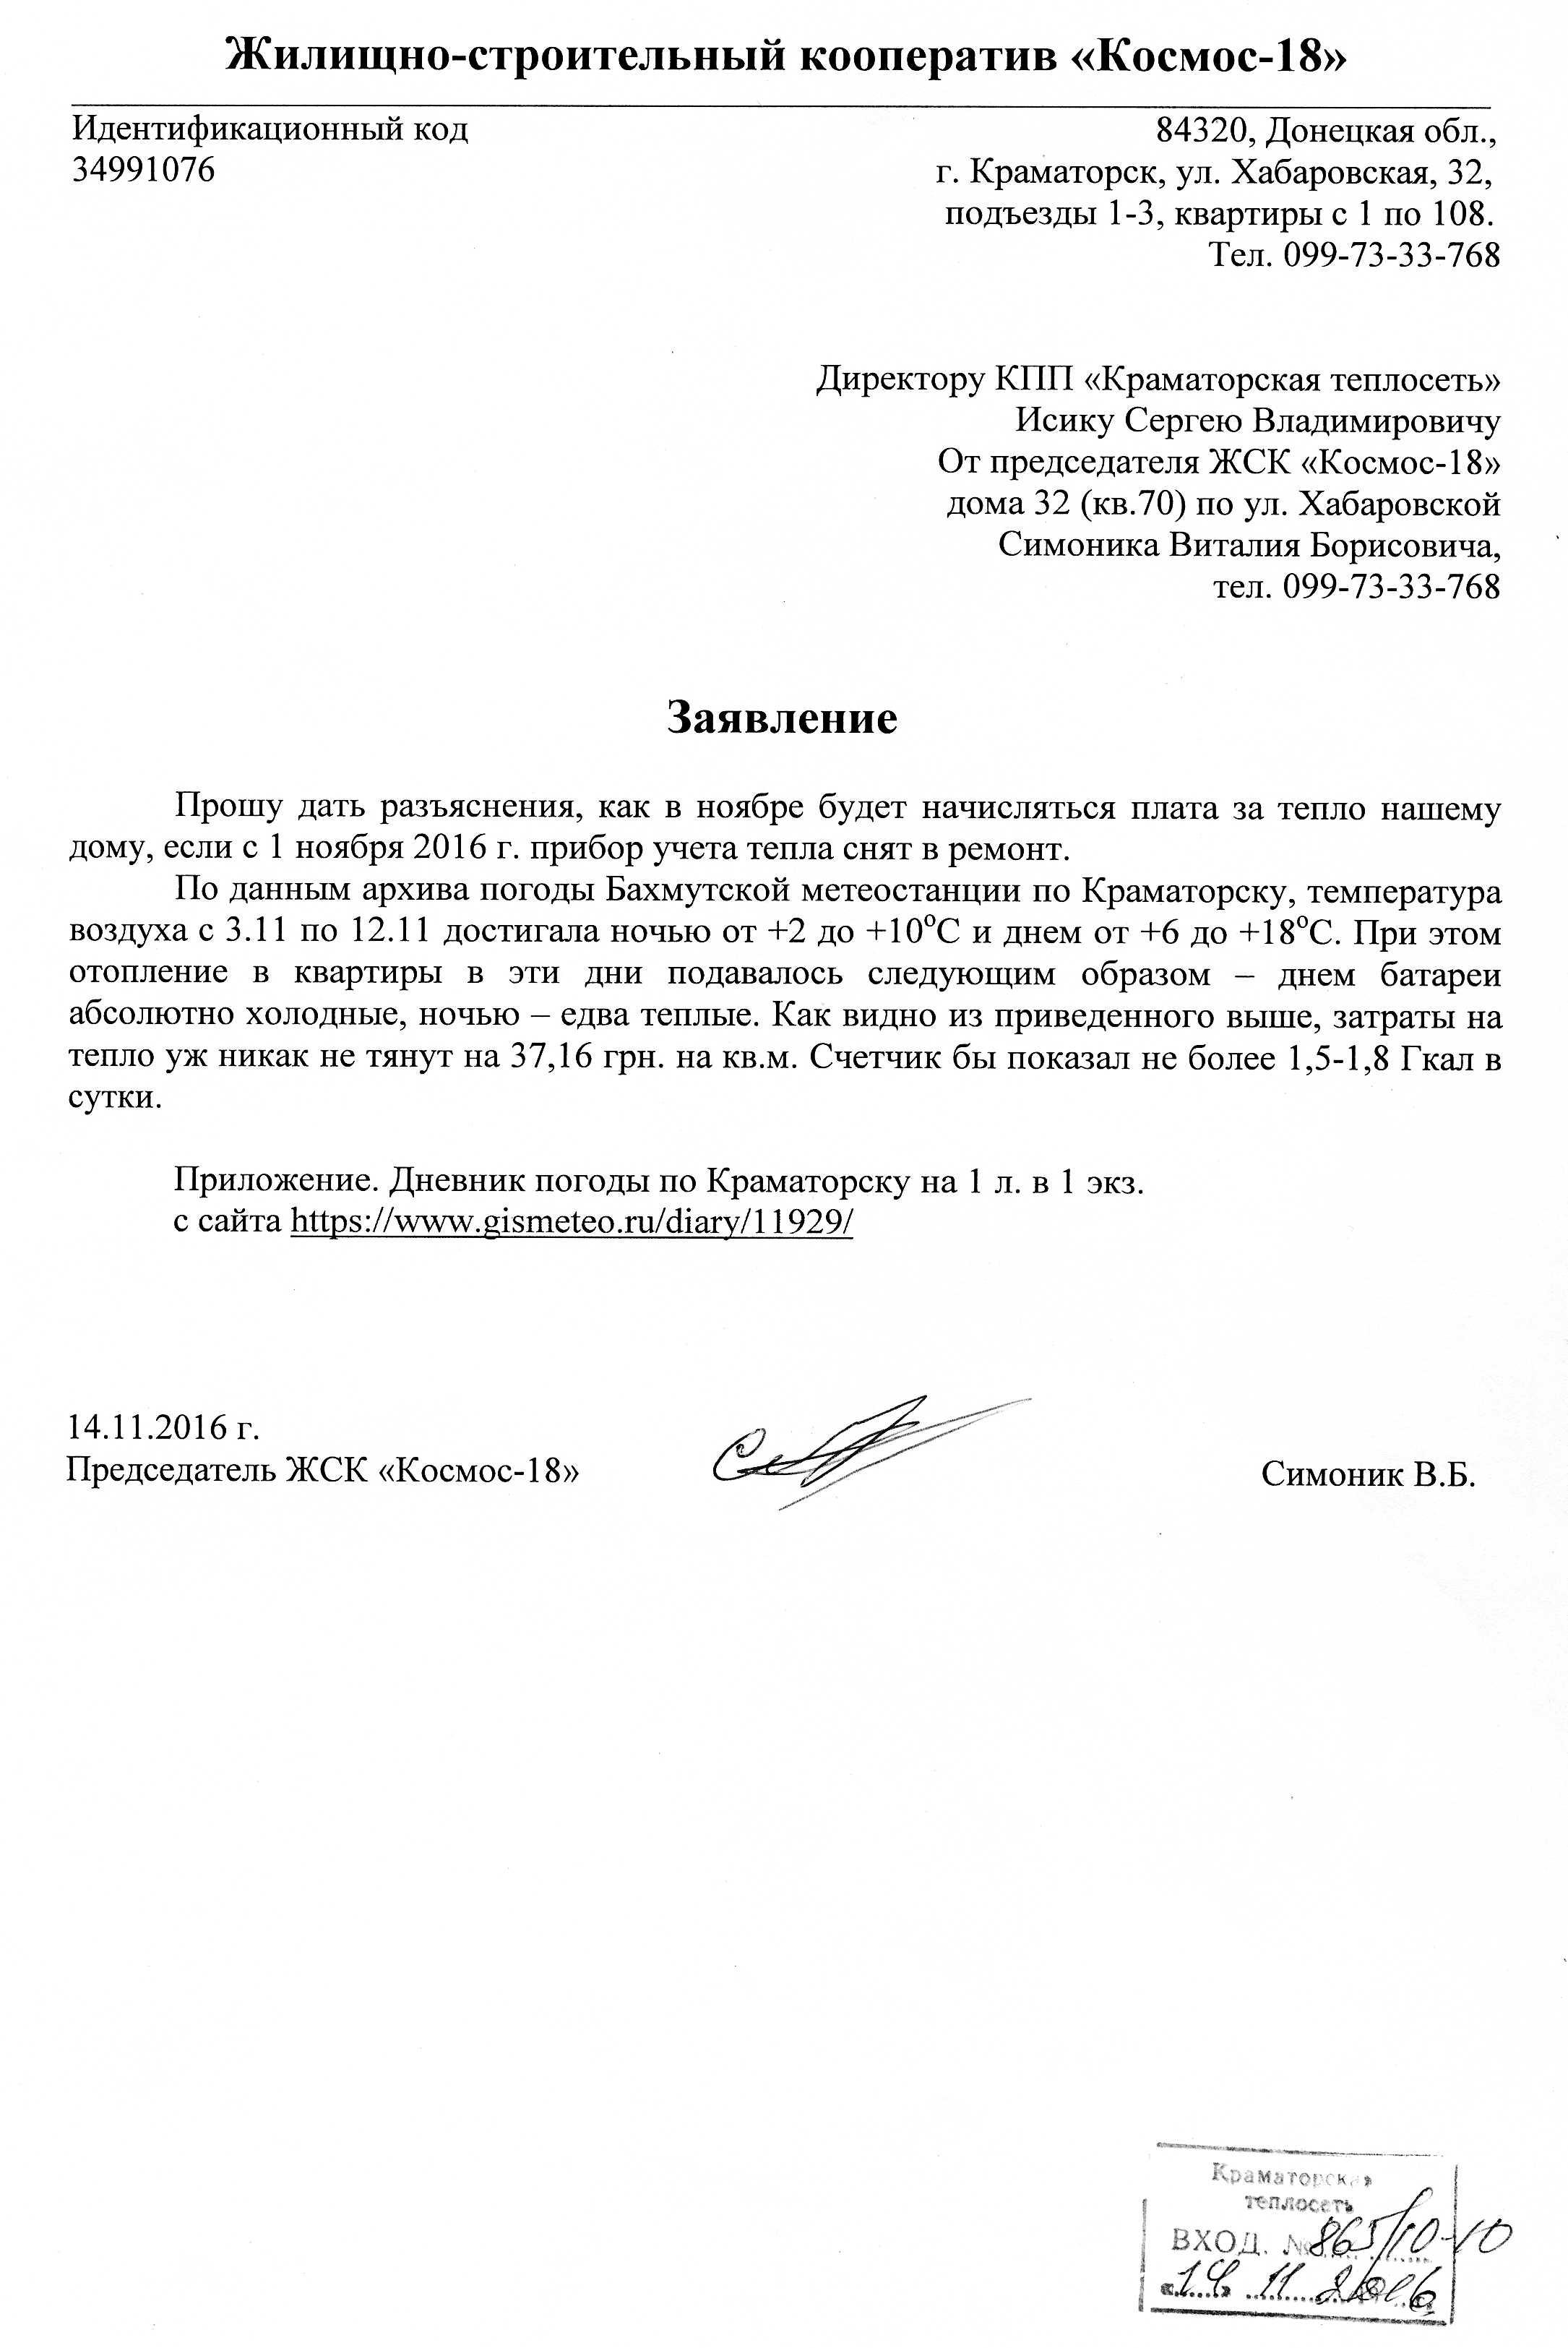 https://img-fotki.yandex.ru/get/141254/248142895.0/0_180ff3_b18f13e8_orig